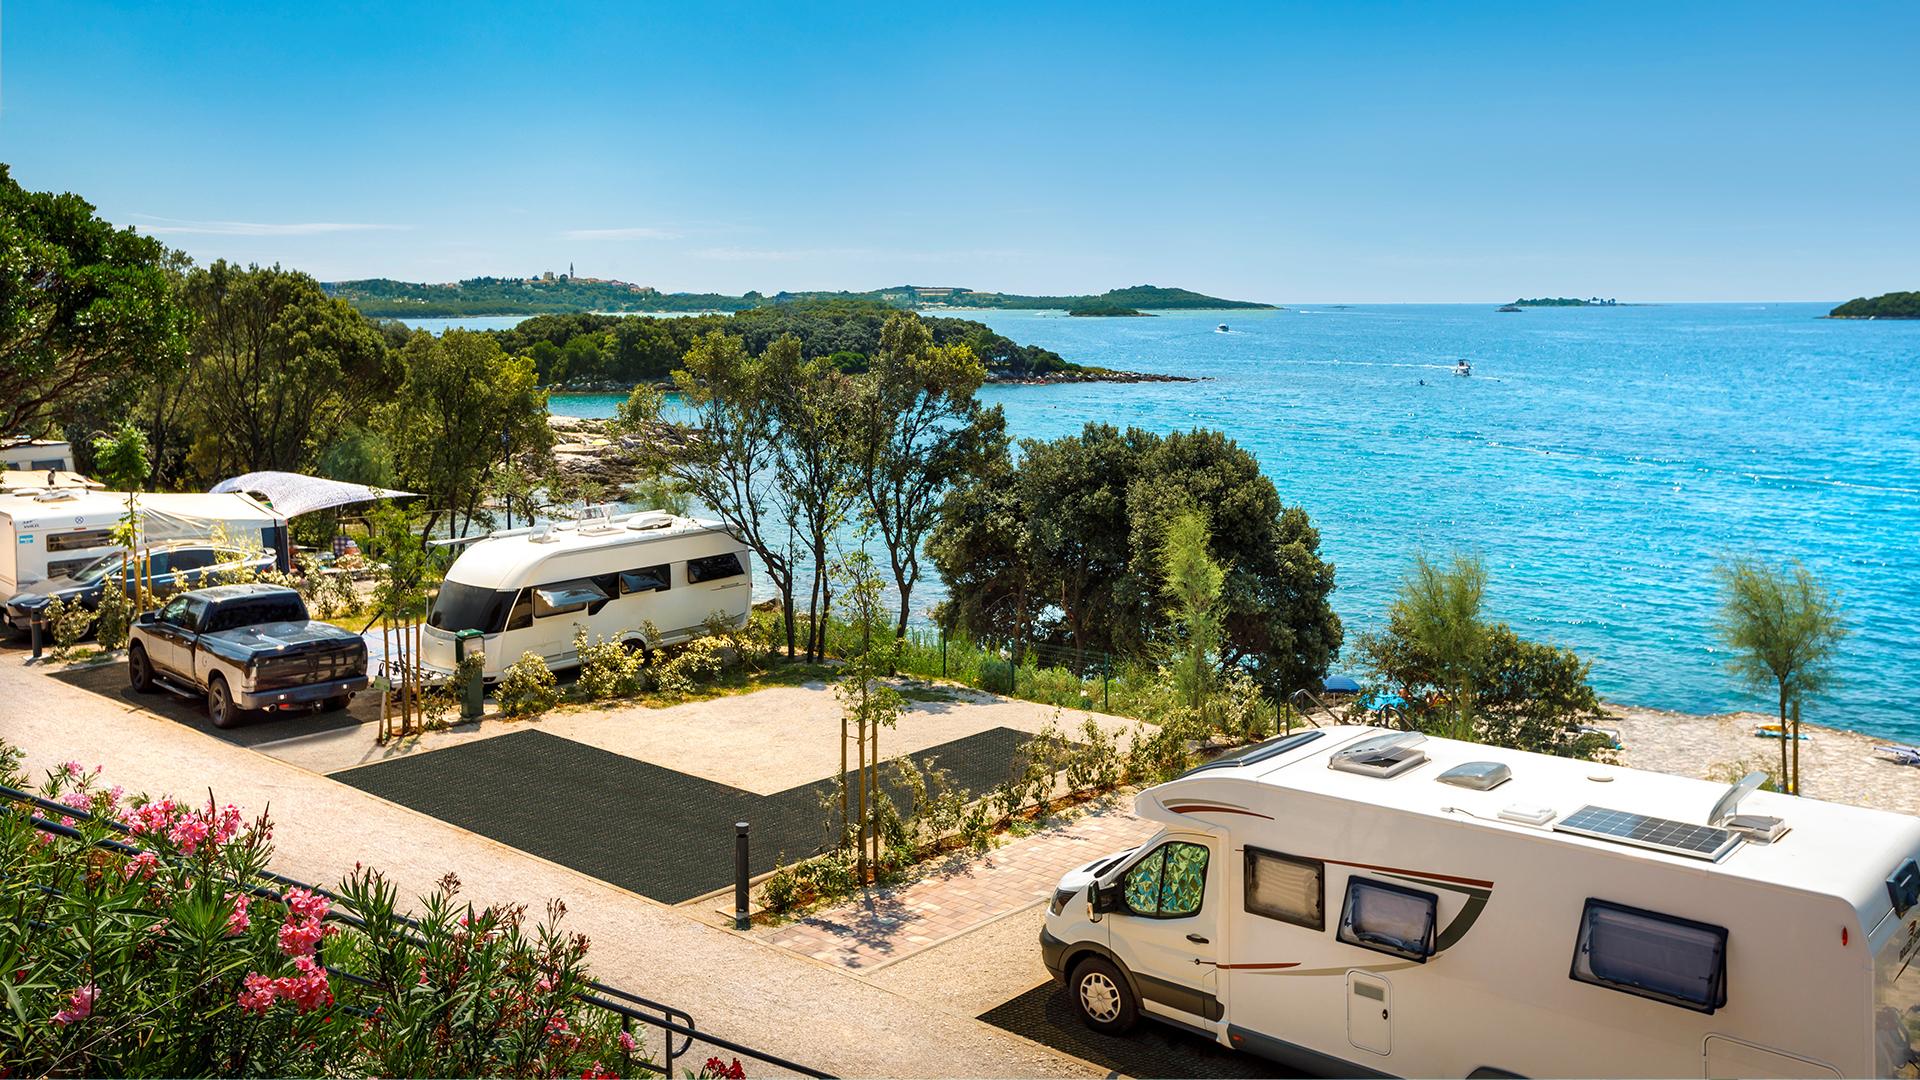 Foto: Valamar Istra Camping Resort